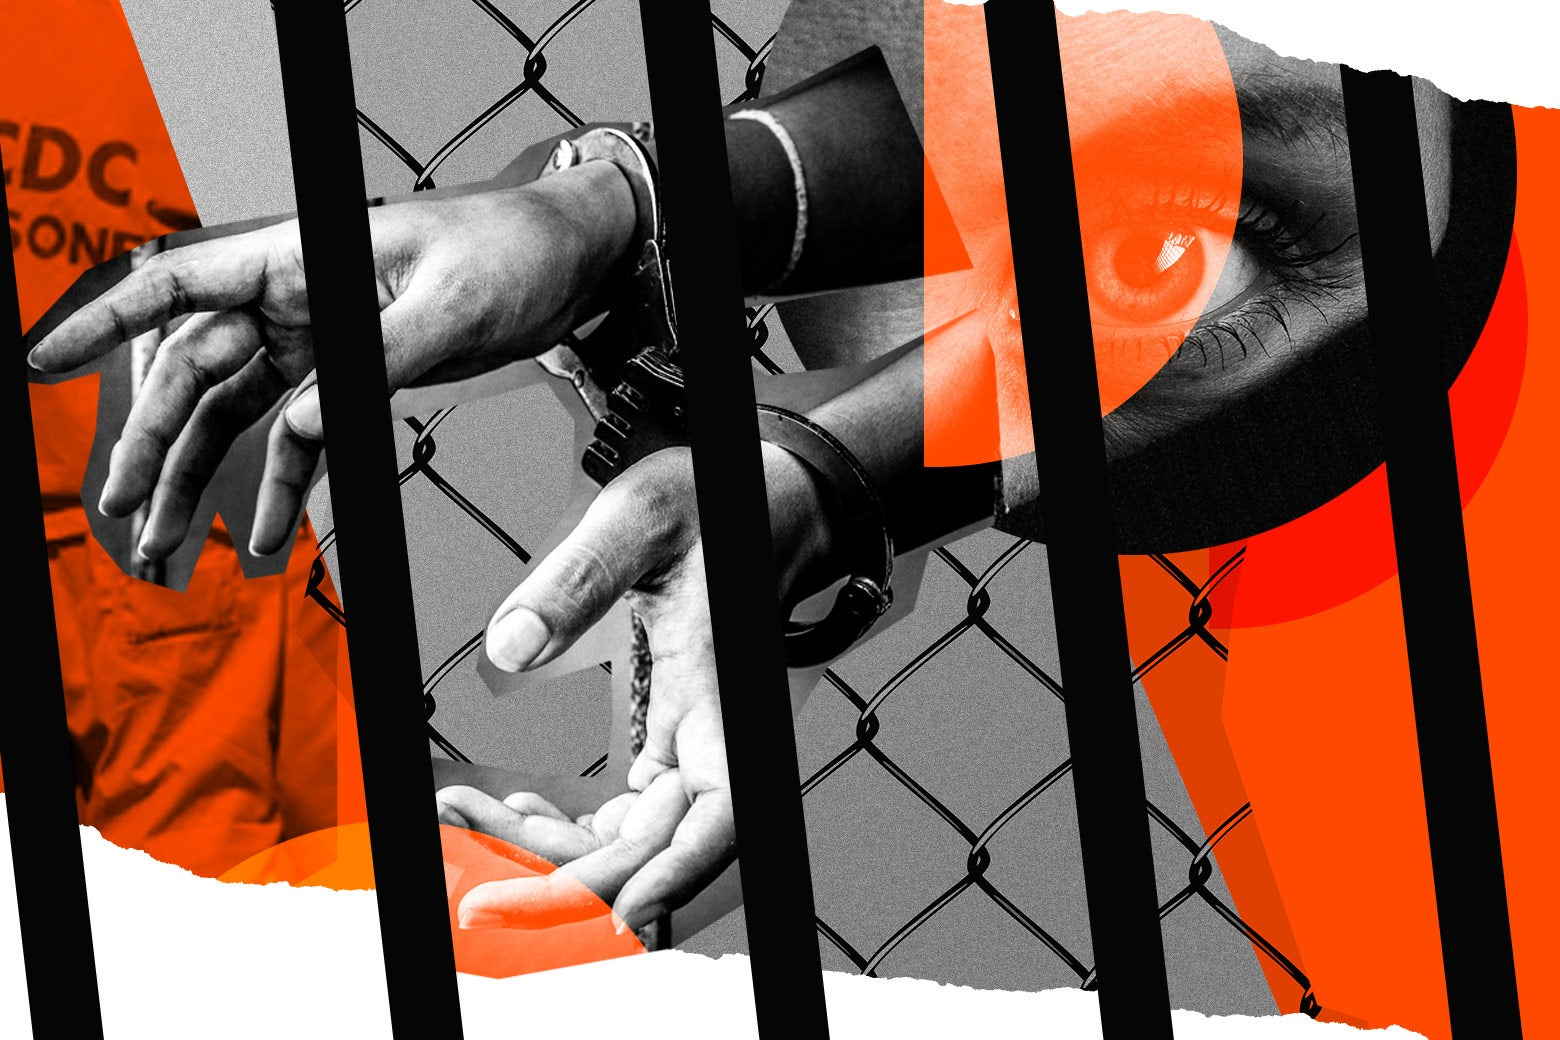 Women's prison collage.